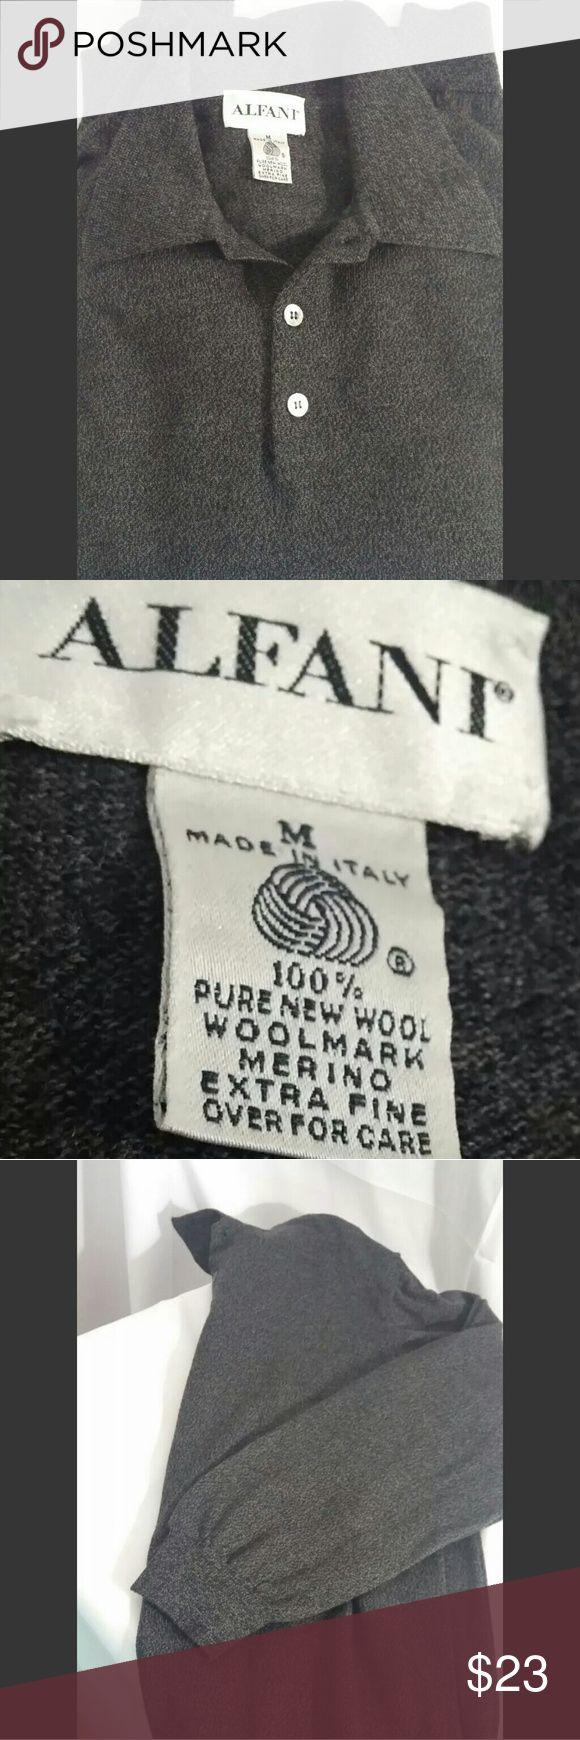 Men's medium Alfani wool pullover sweater men's long sleeve ALFANI 100% wool charcoal gray pullover sweater. button up neck. made in Italy. size: Medium.  223/clo2 Alfani Sweaters